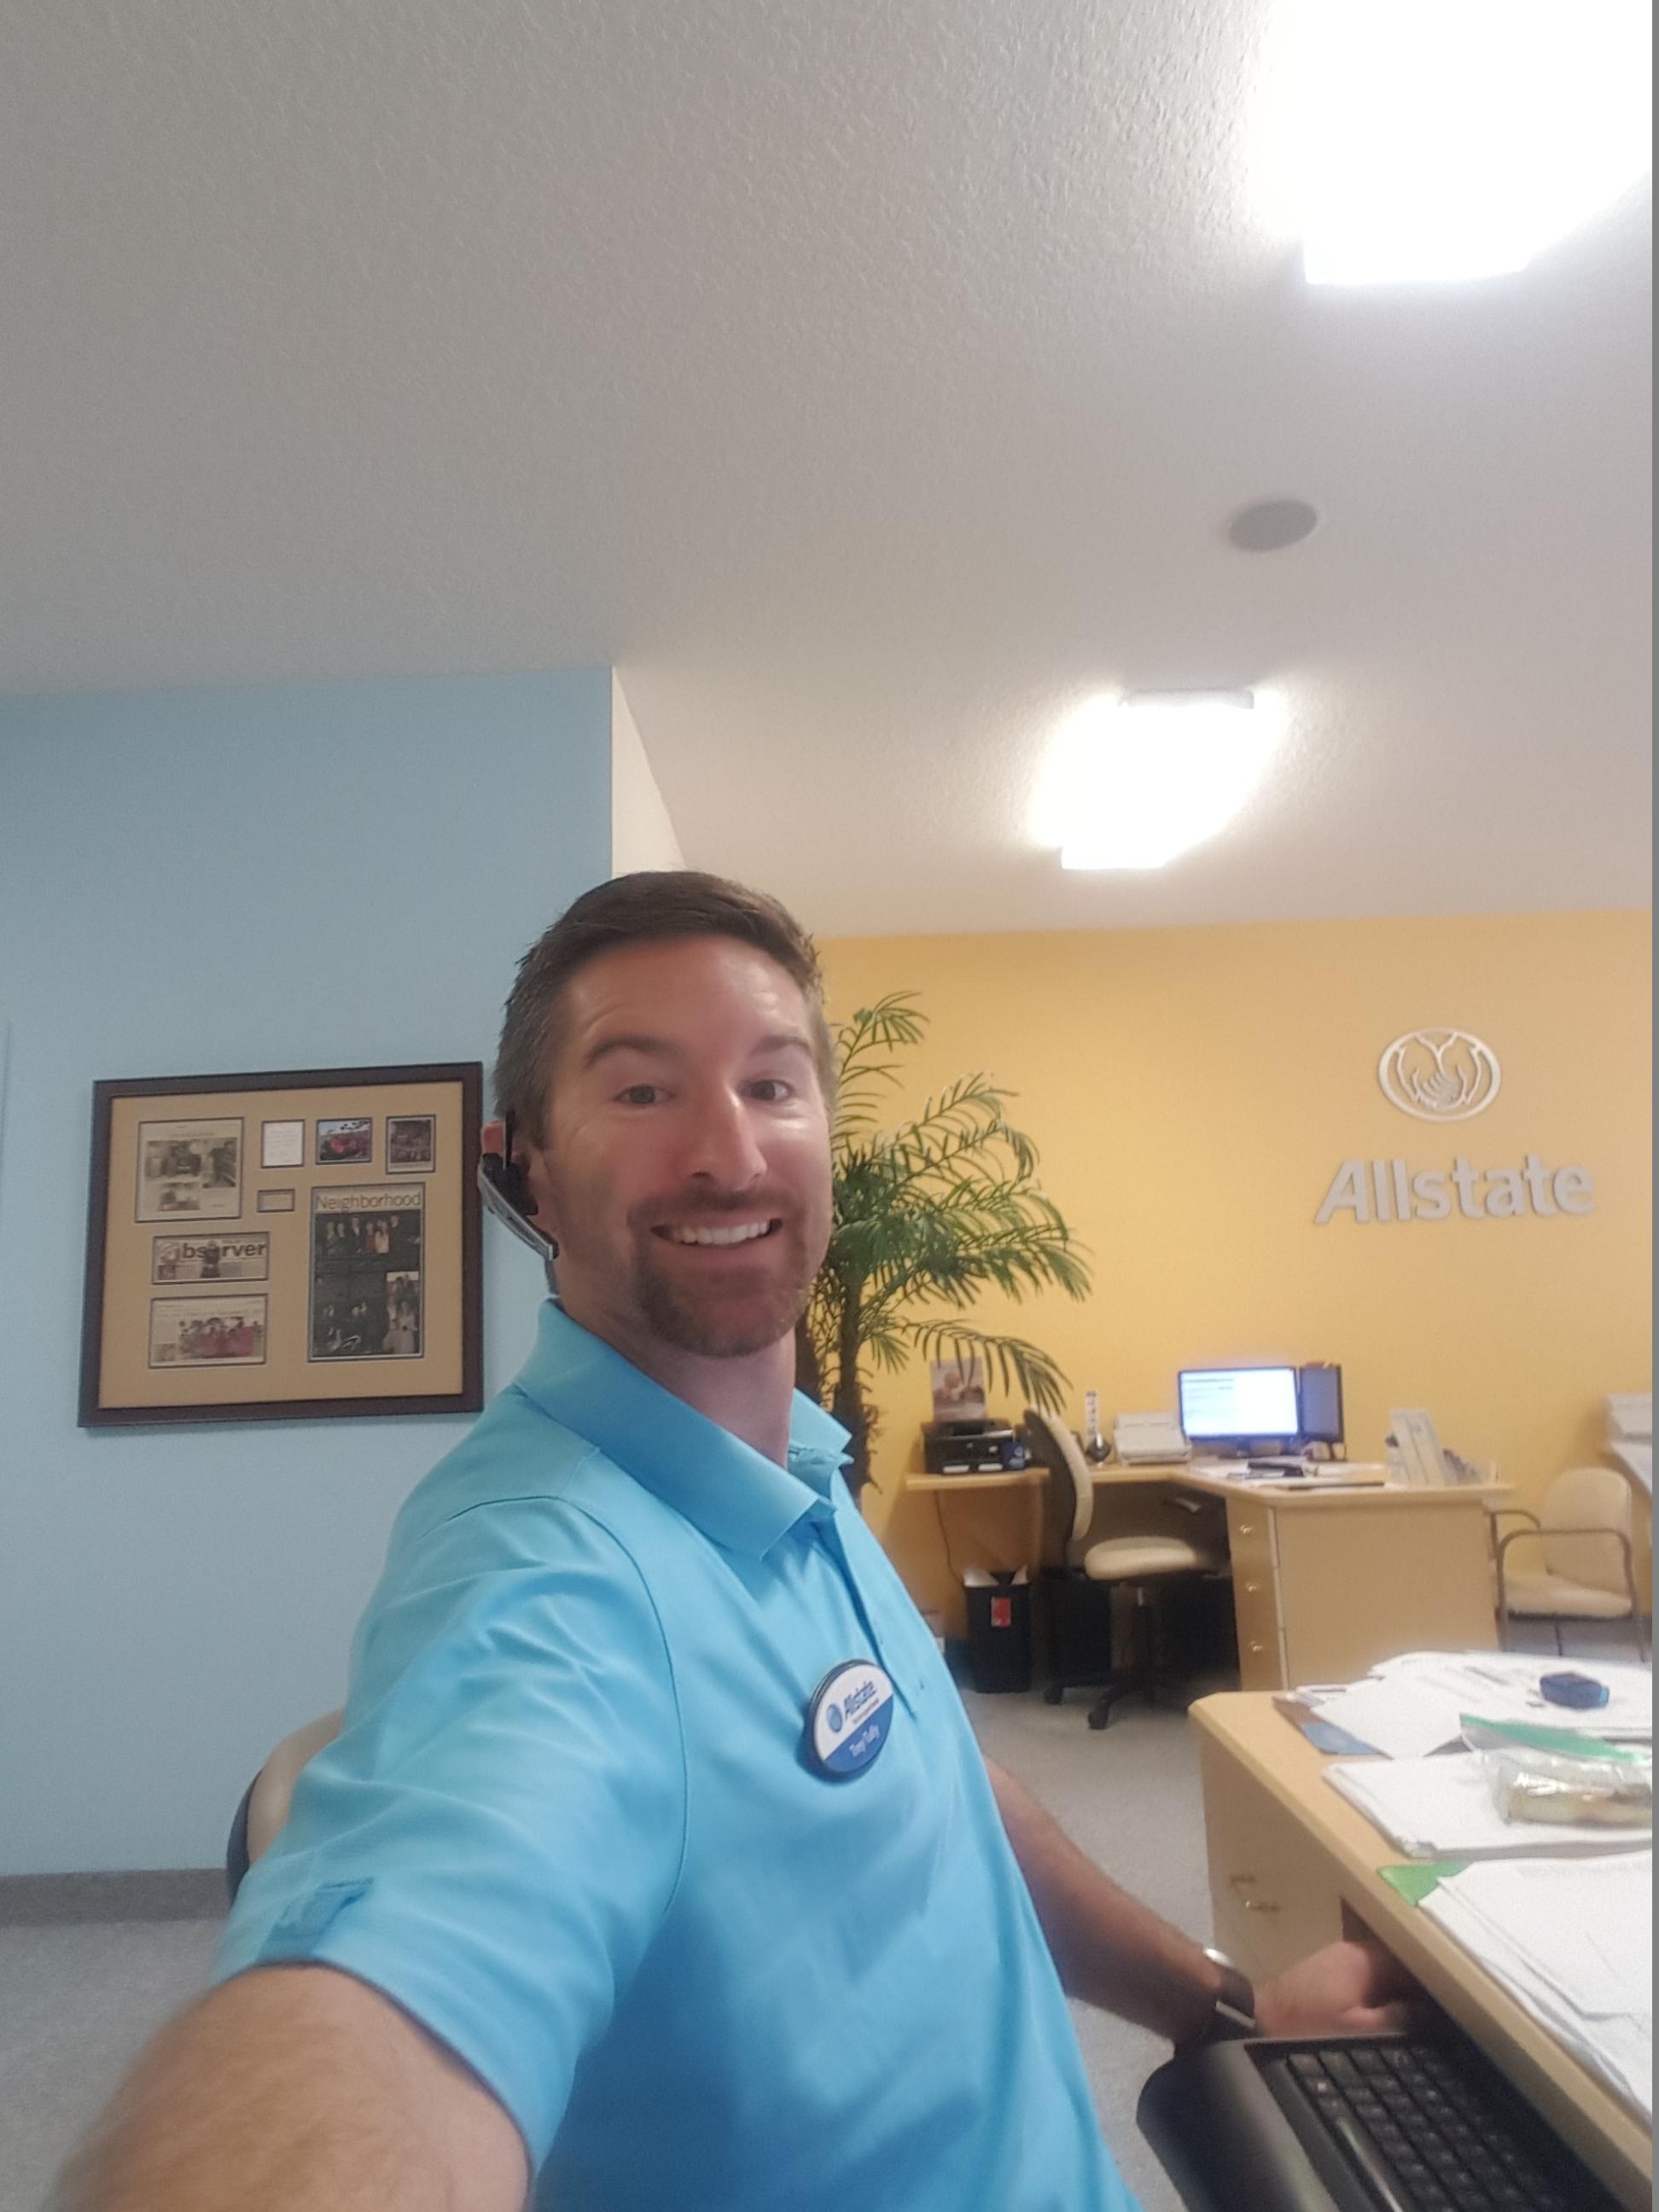 Trey Tully: Allstate Insurance image 1